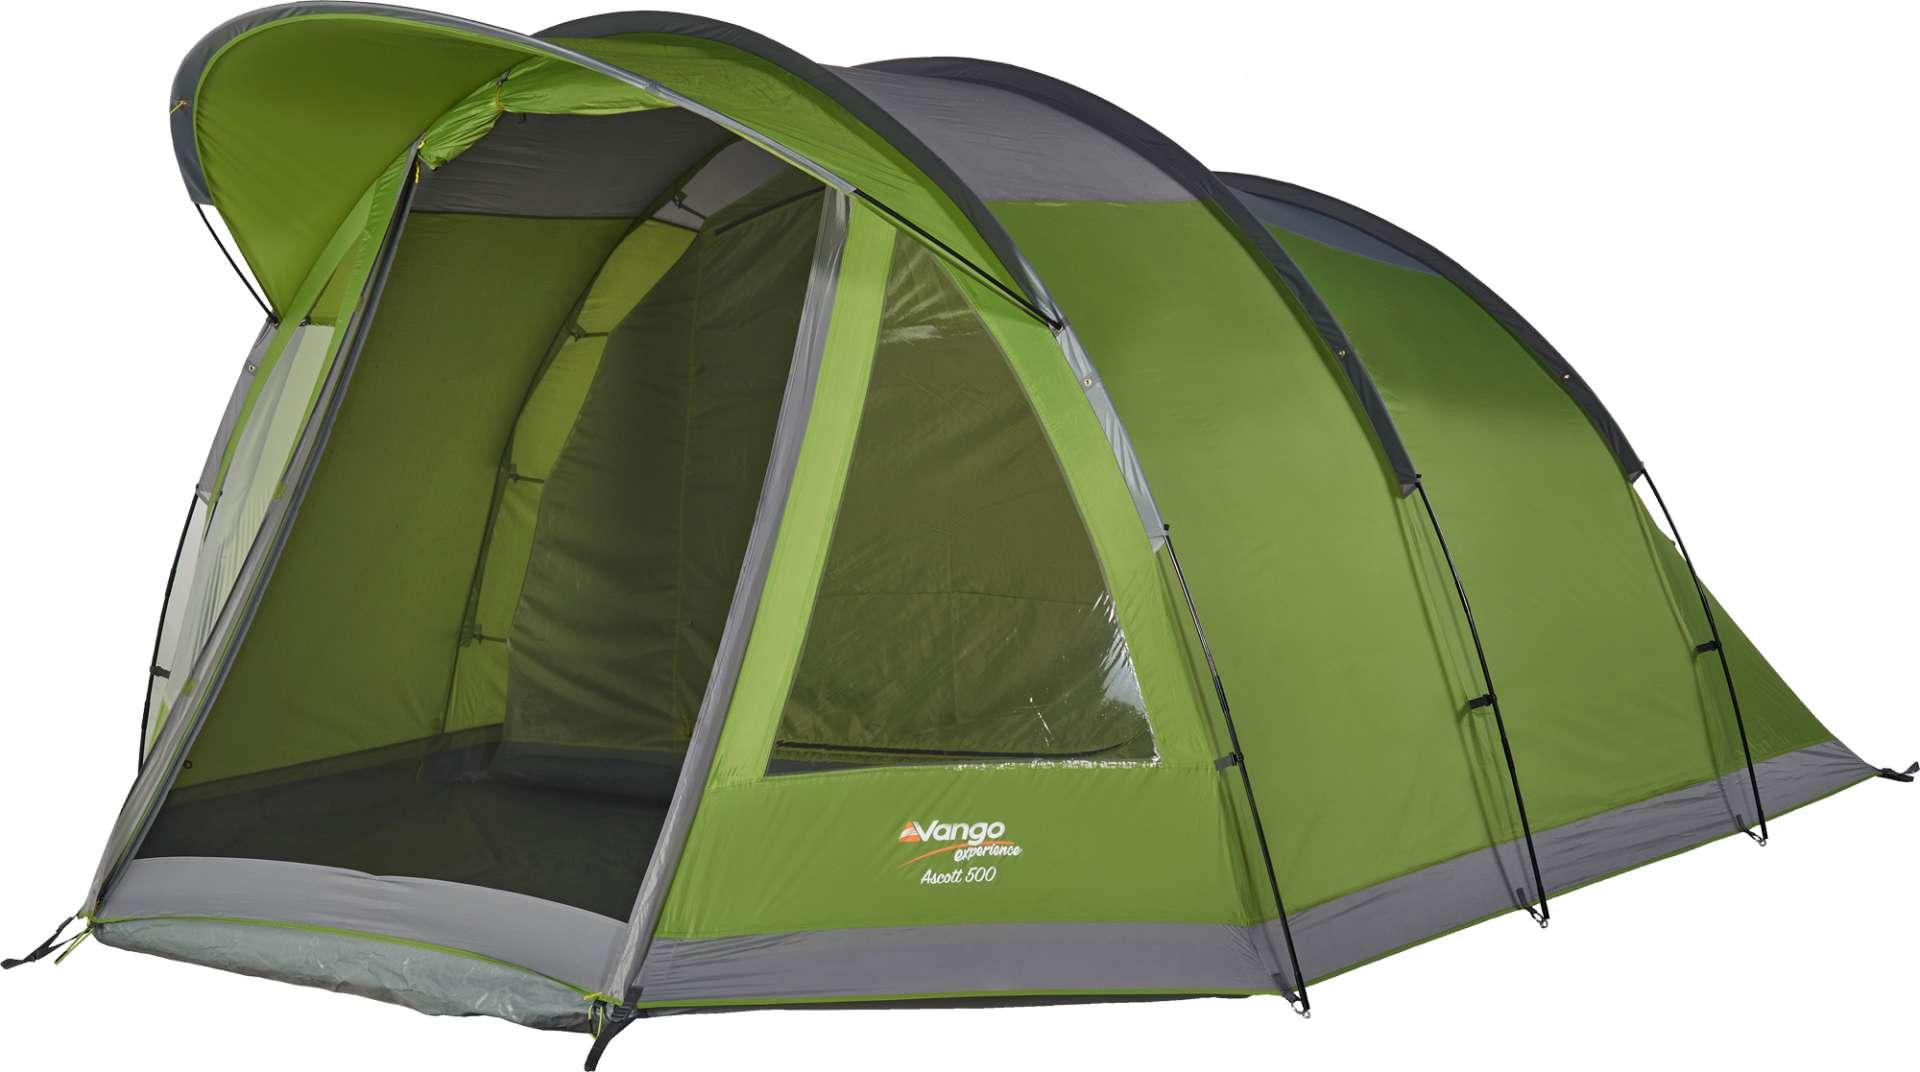 Vango Tunnelzelt Langley 500 Fritz Berger Campingbedarf